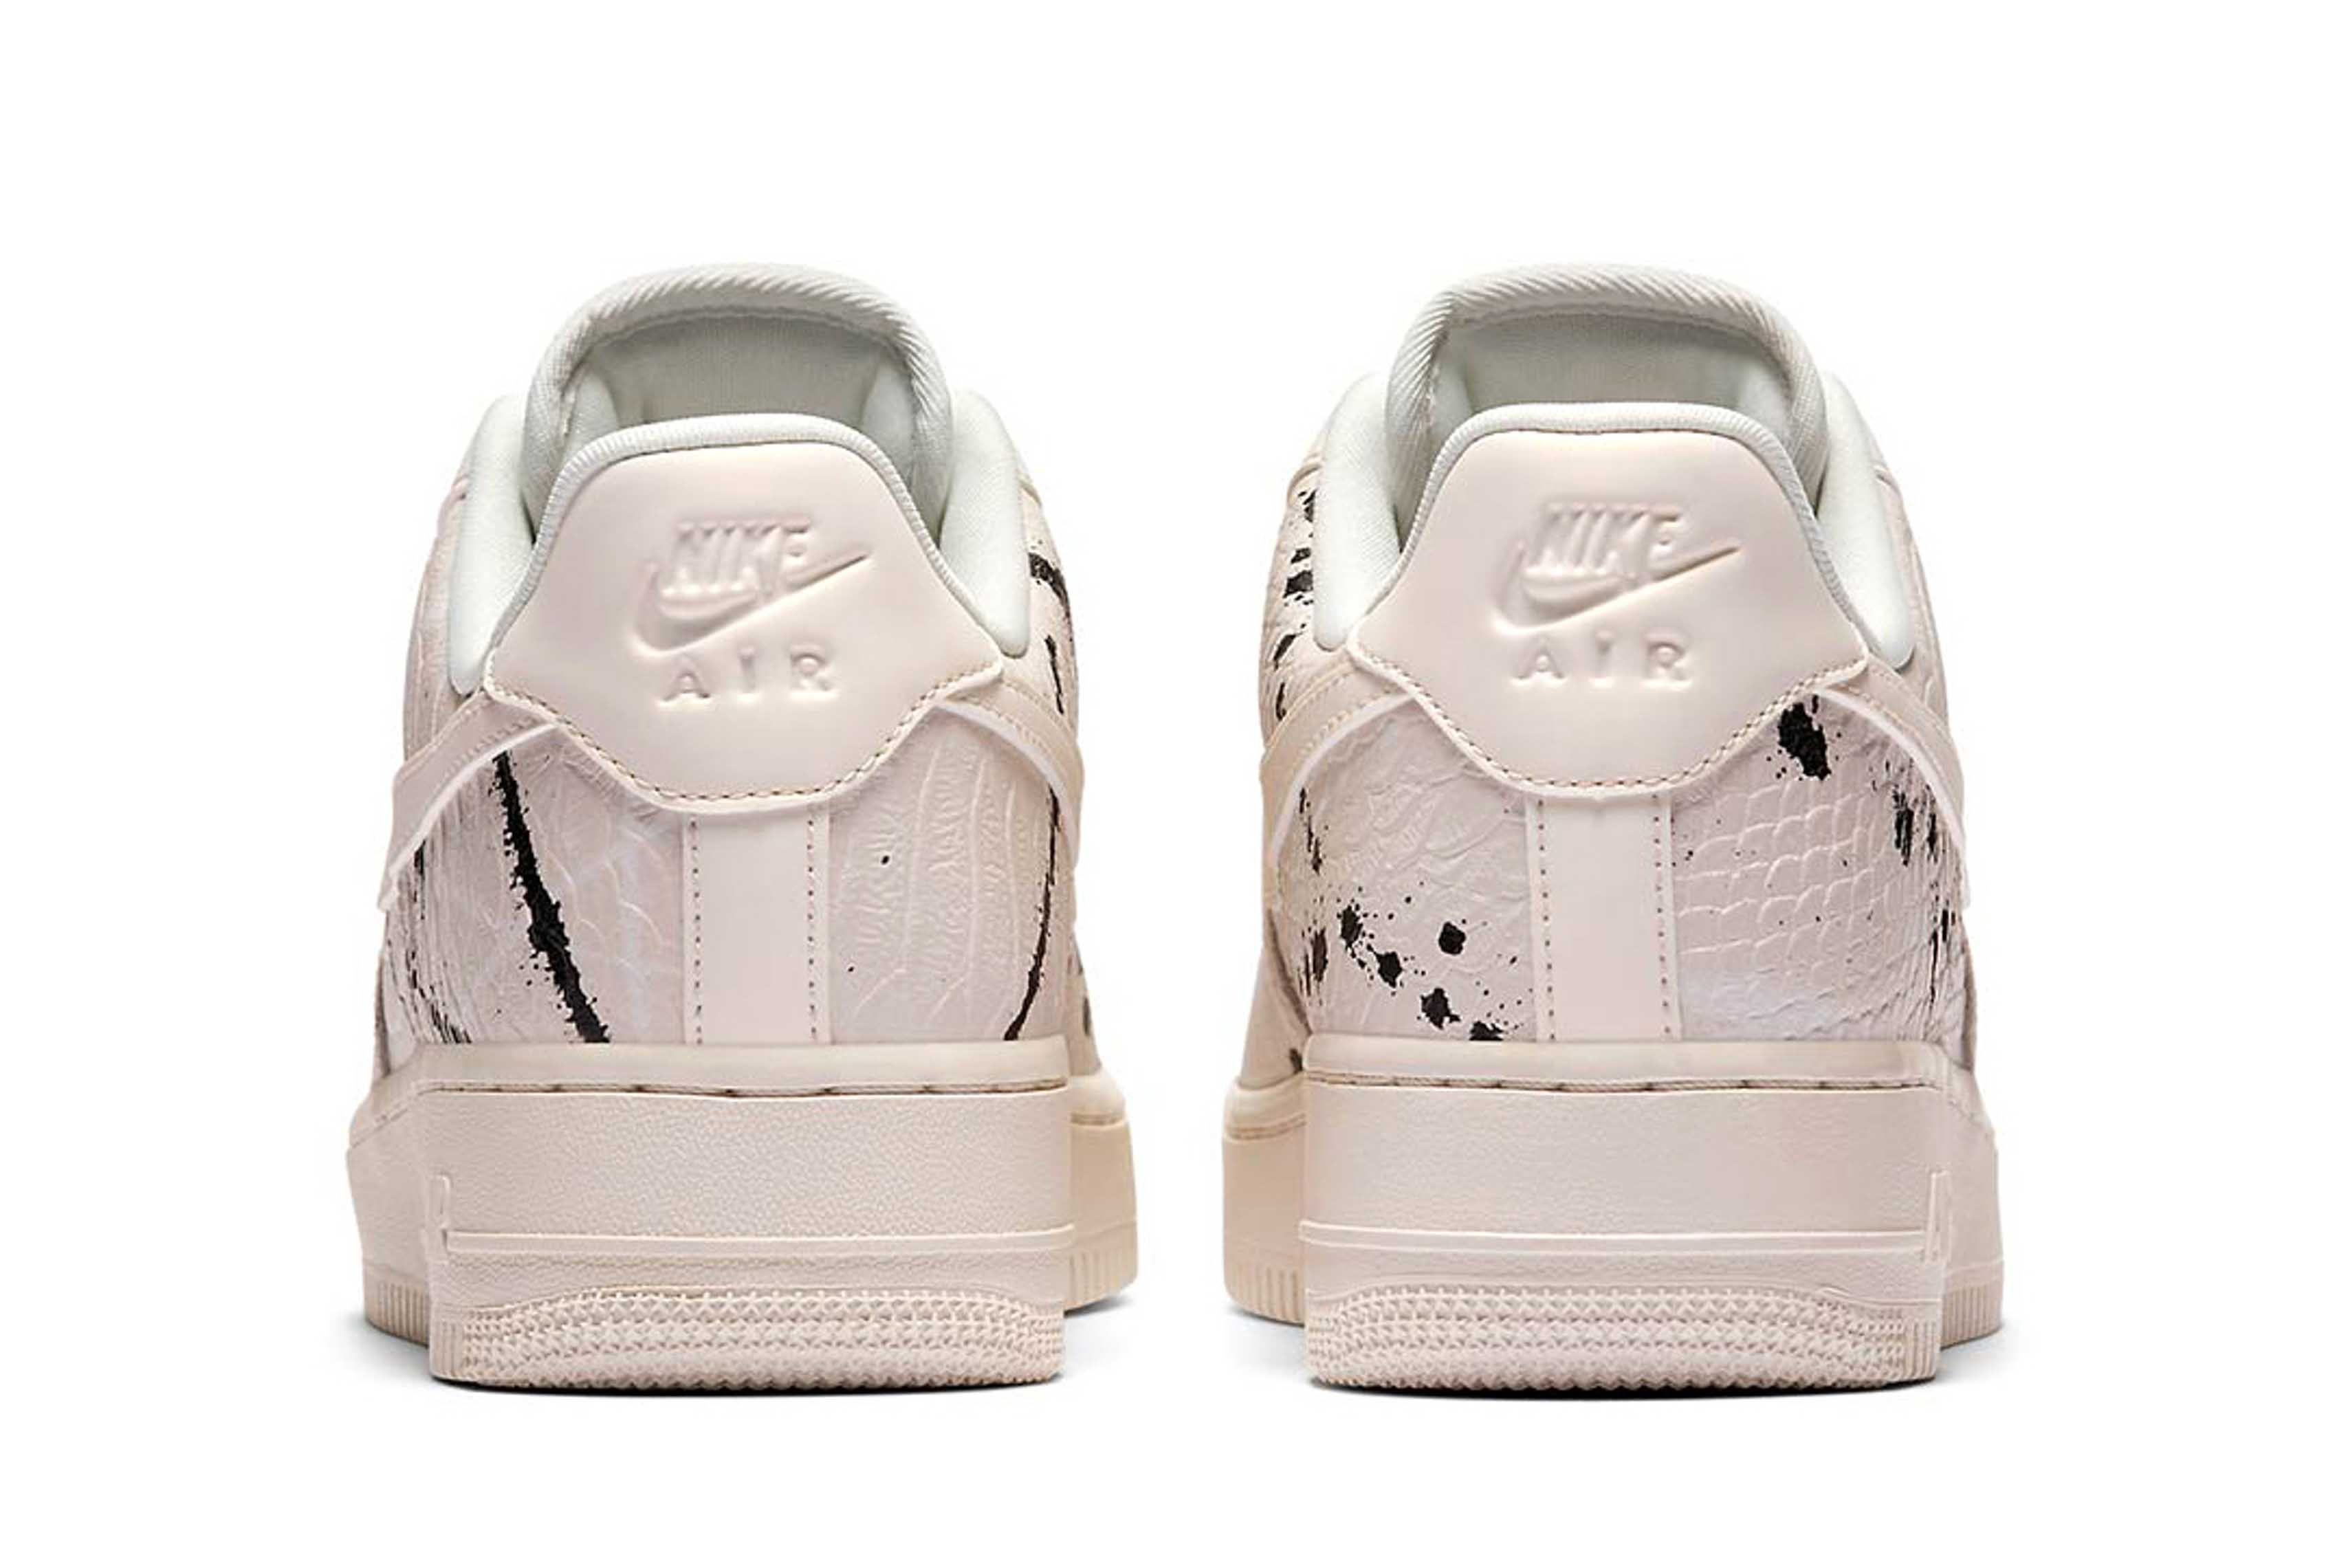 Nike Air Force 1 Low Phantom Snakeskin Release 05 Sneaker Freaker